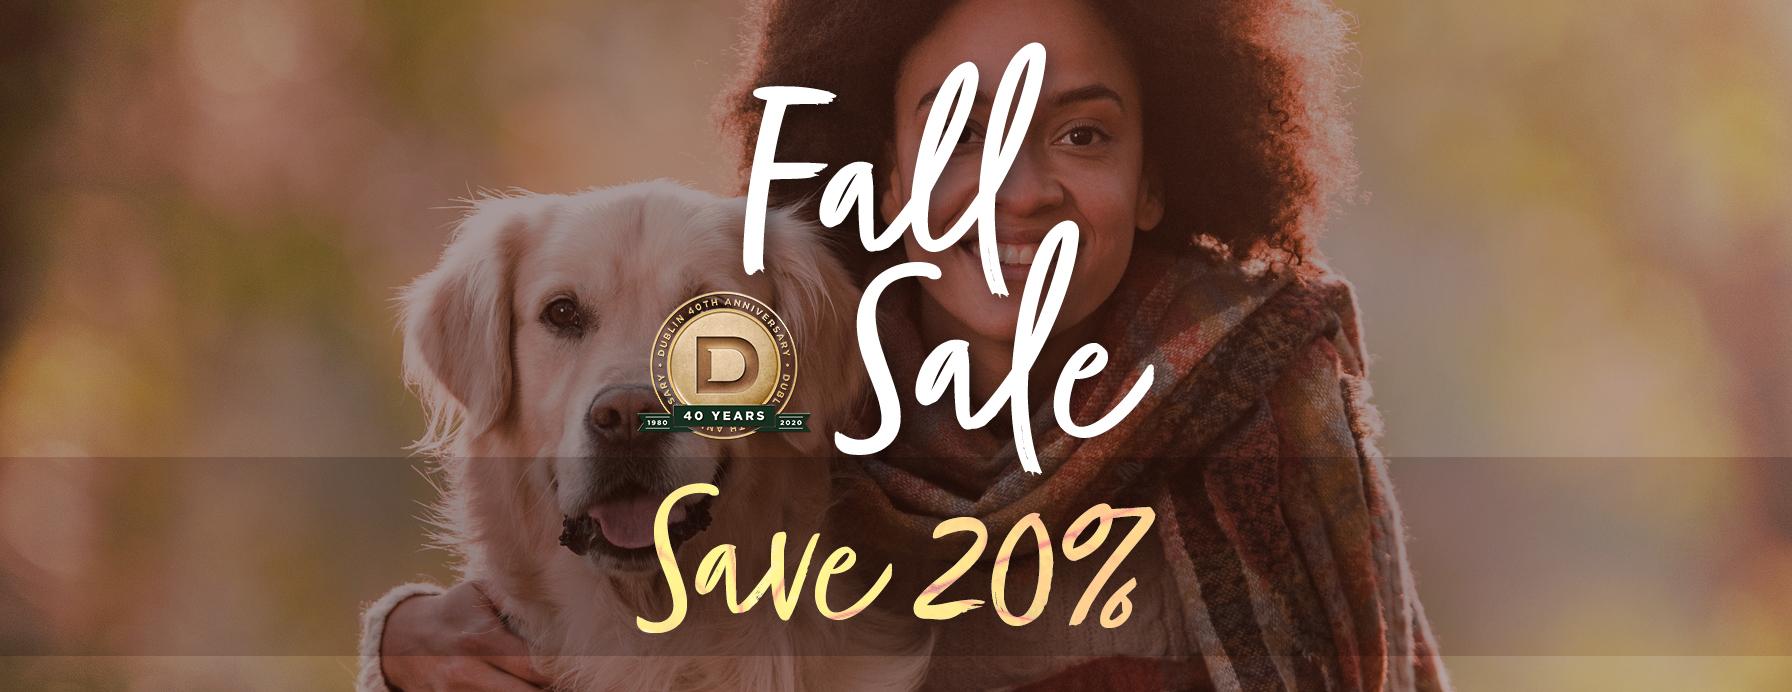 Shop the Dublin Fall Sale